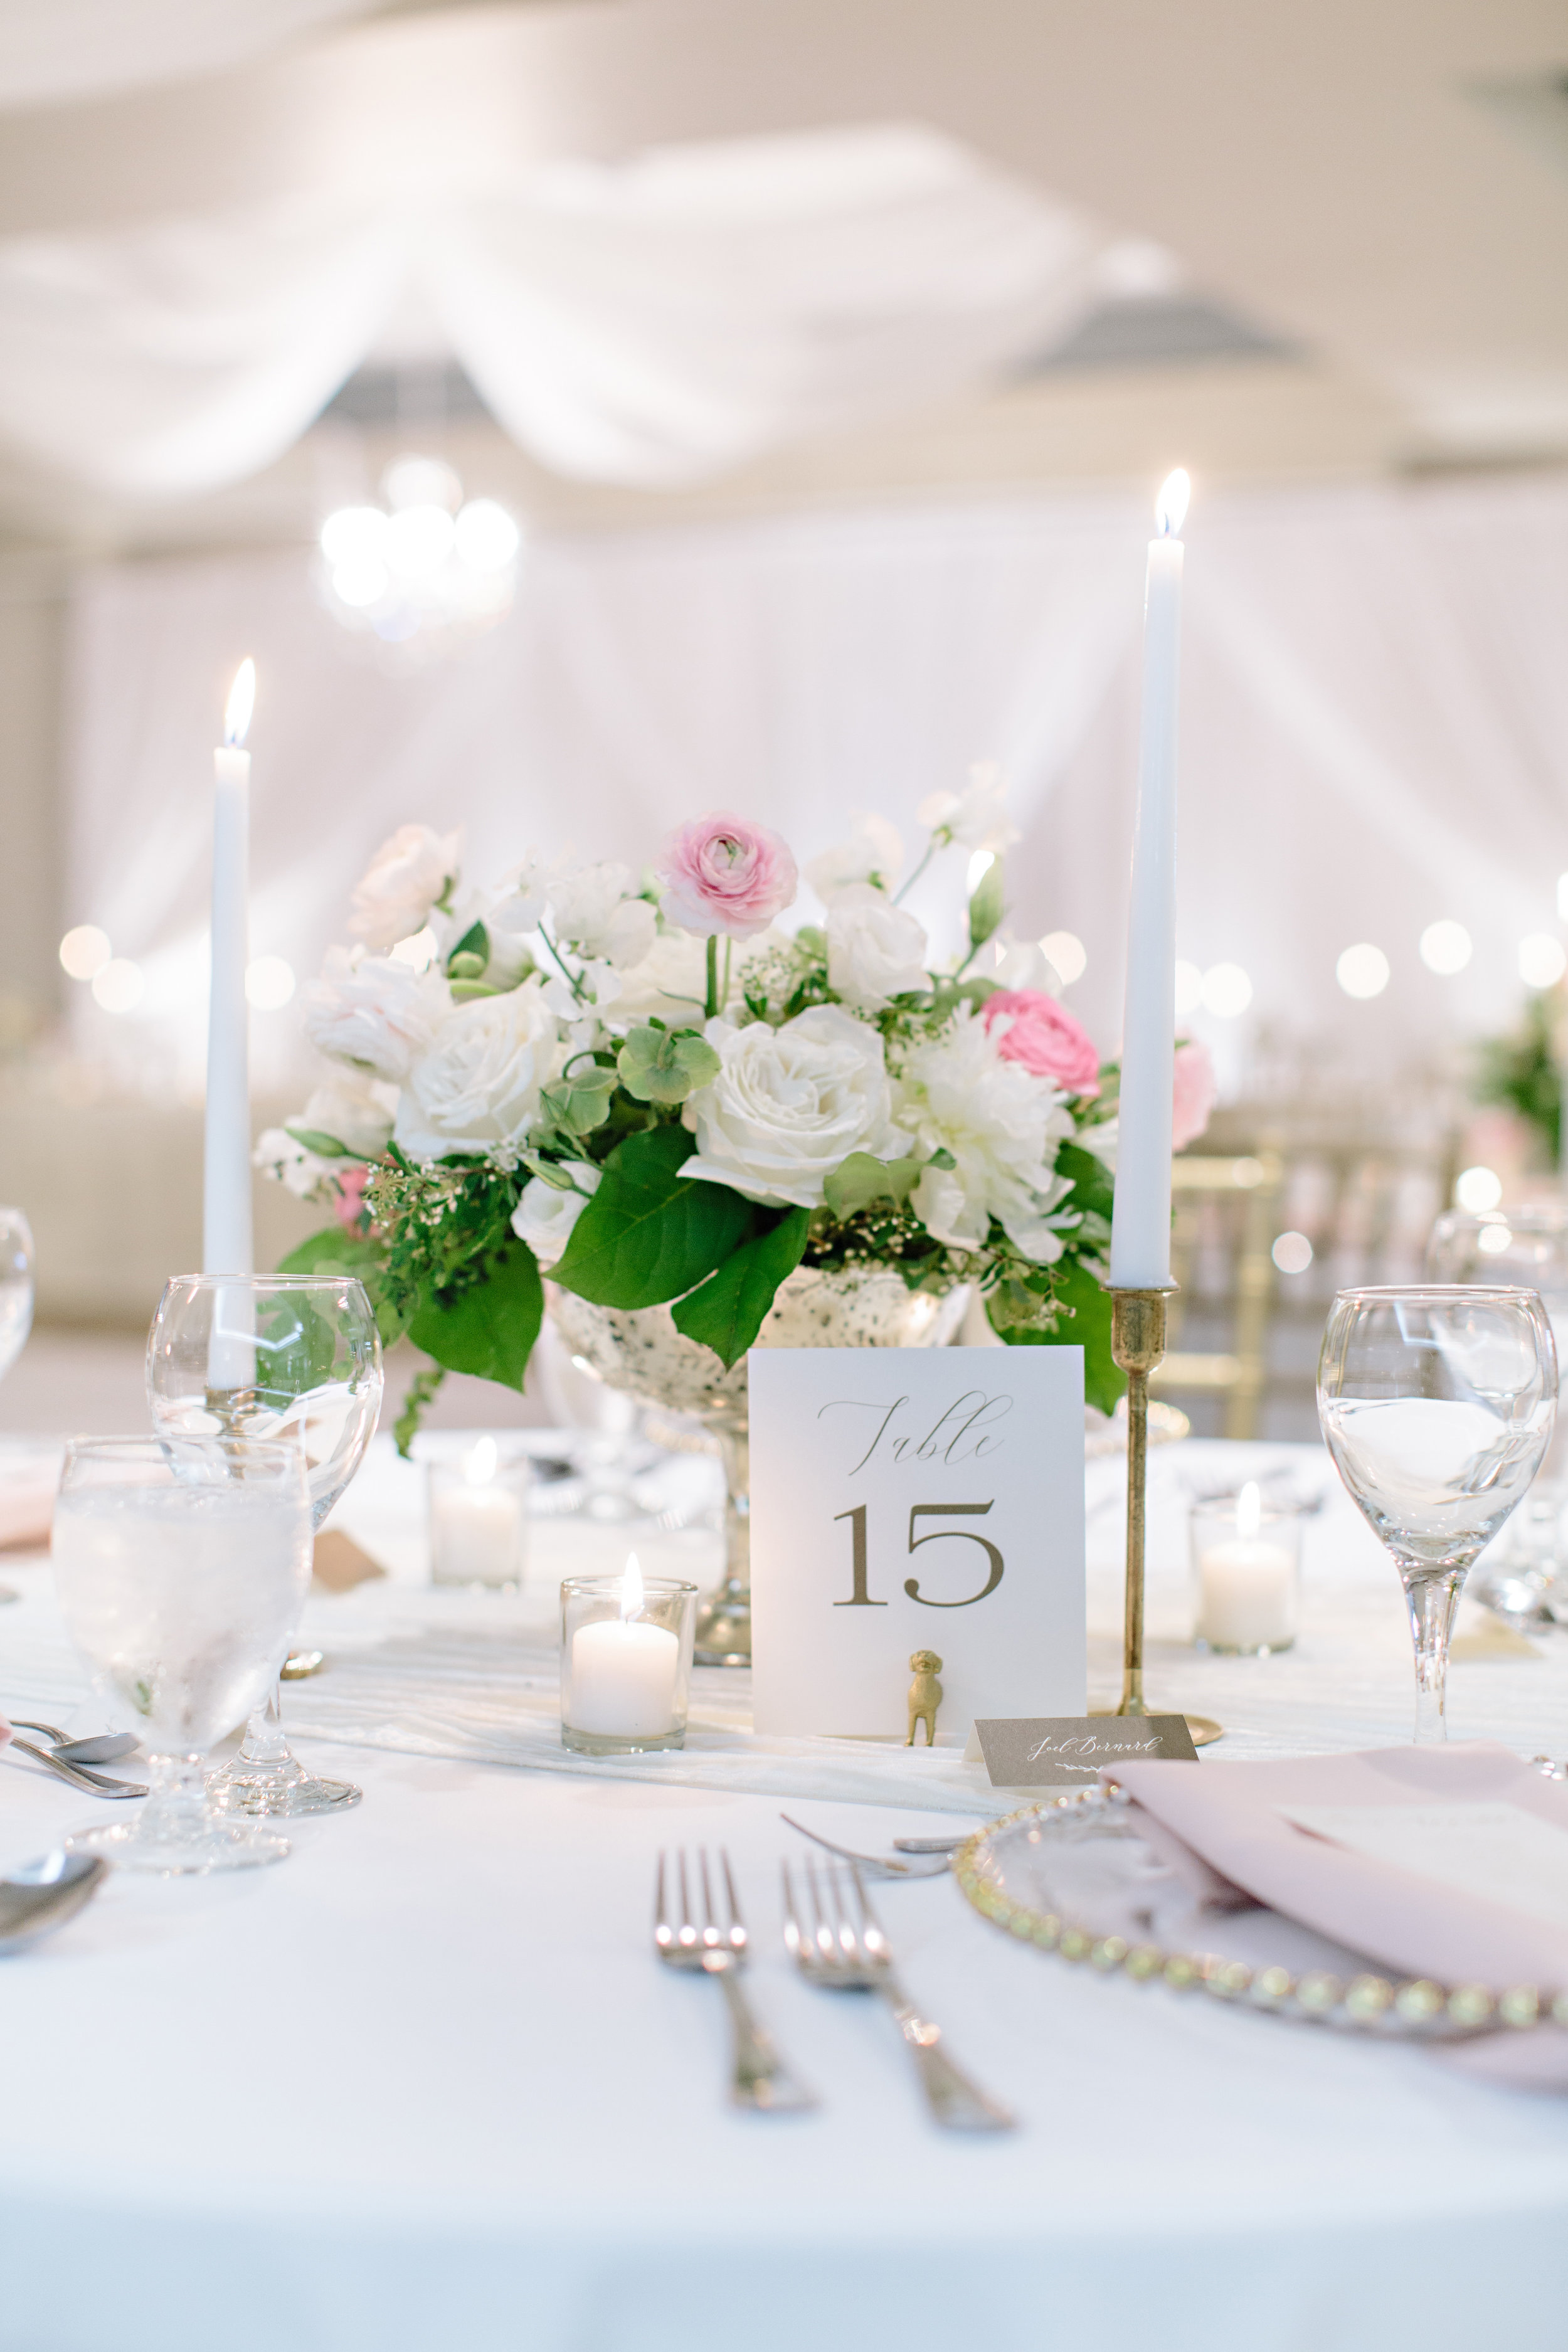 Timeless Kelowna Wedding Table Centerpiece.jpg